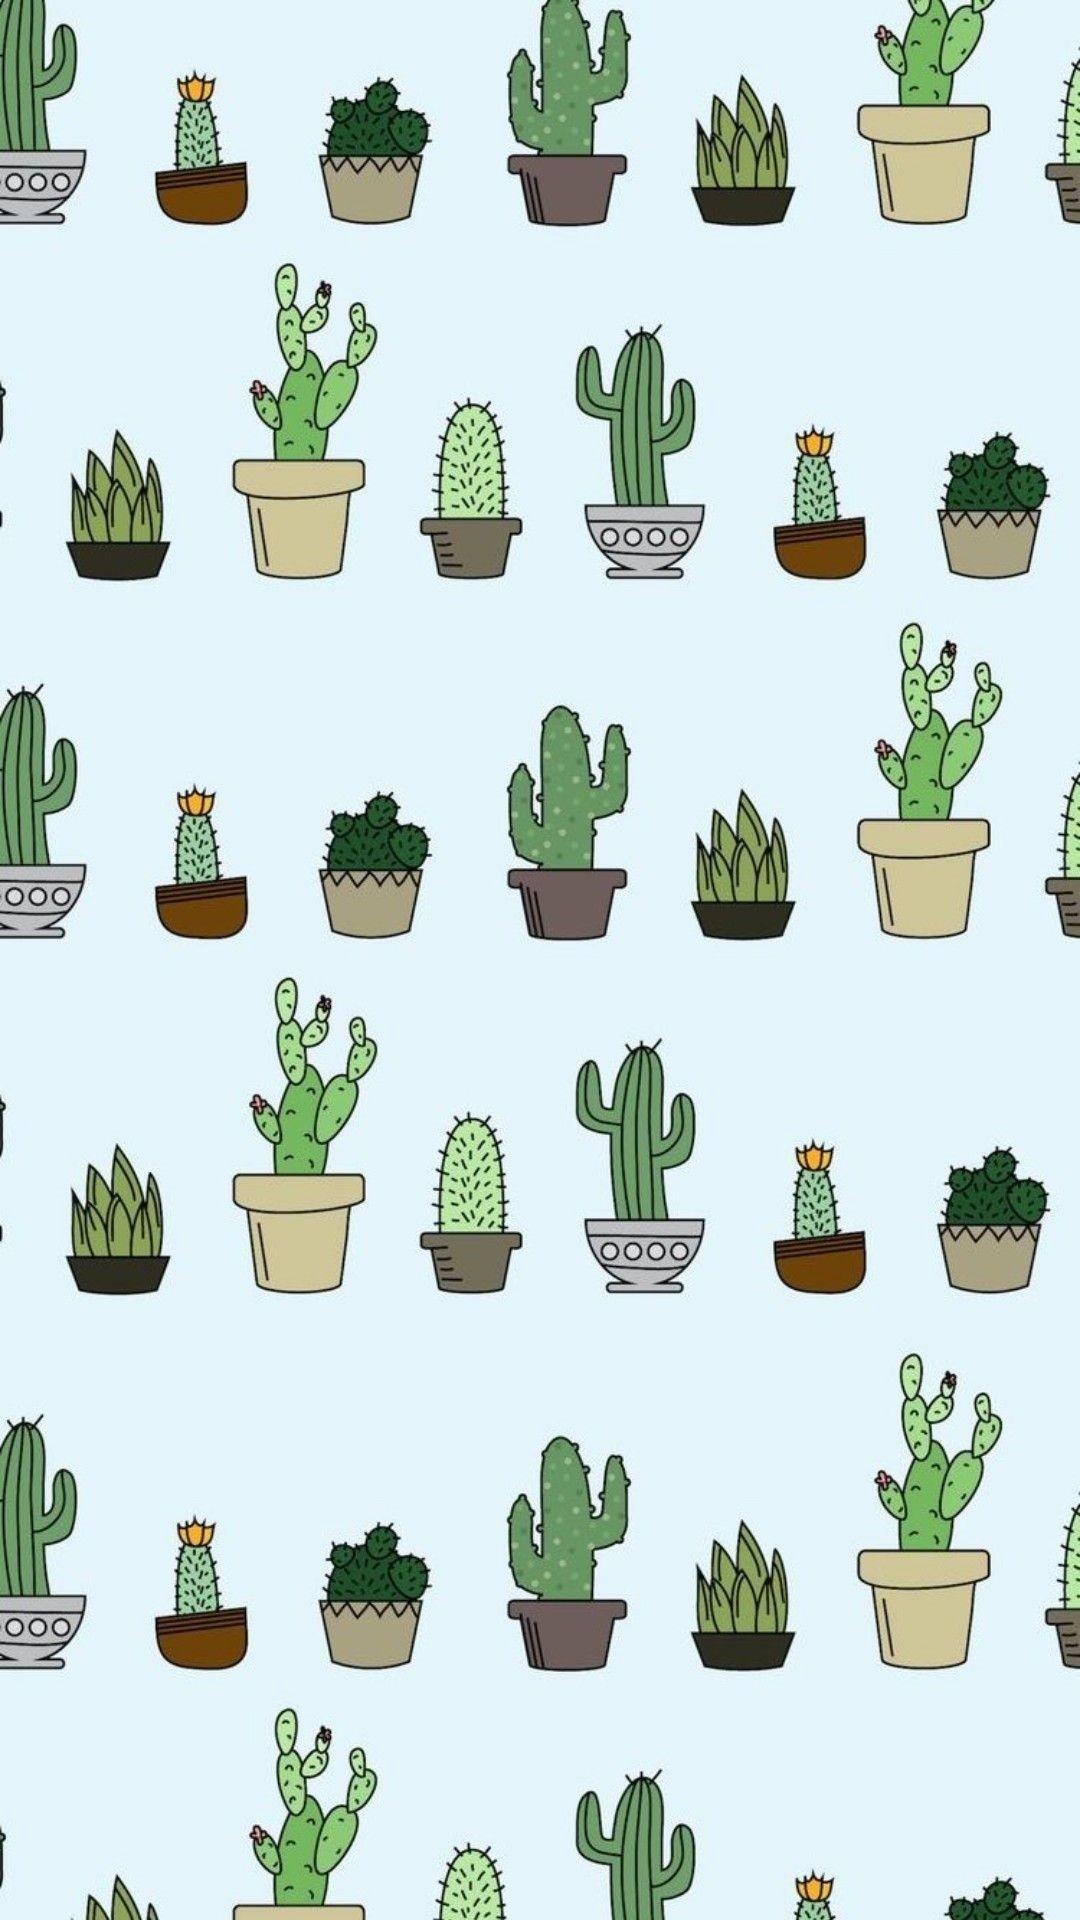 Cactus iphone home screen wallpaper